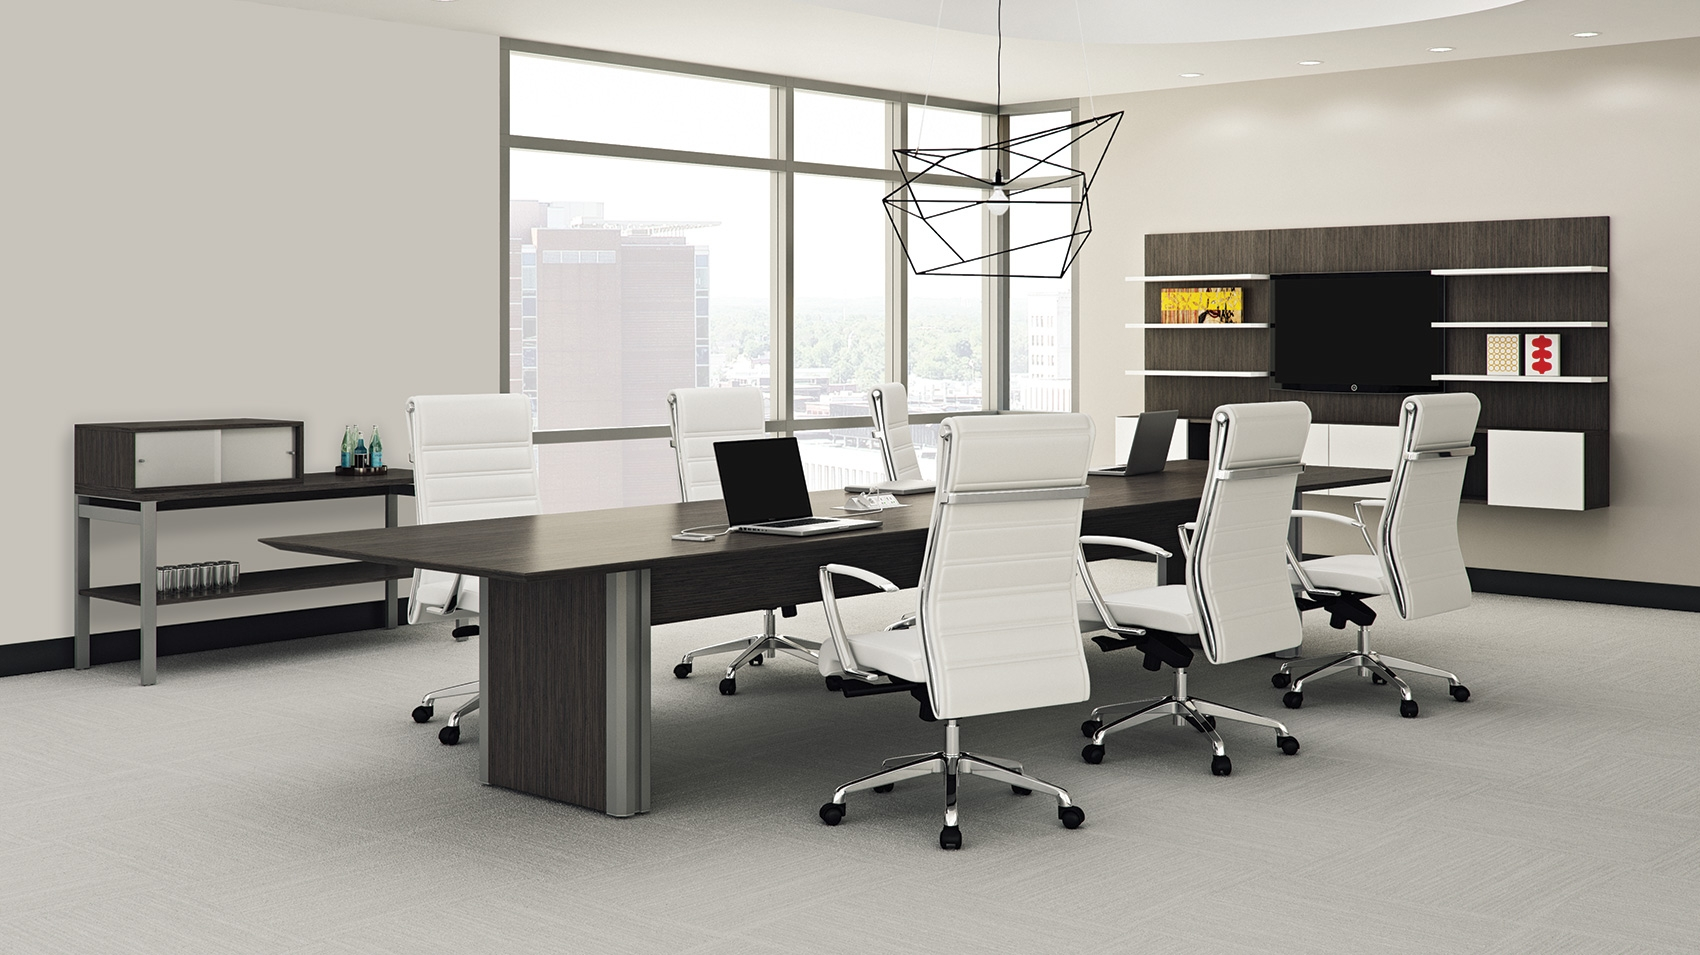 Intermix Work 2 Office Furniture Group